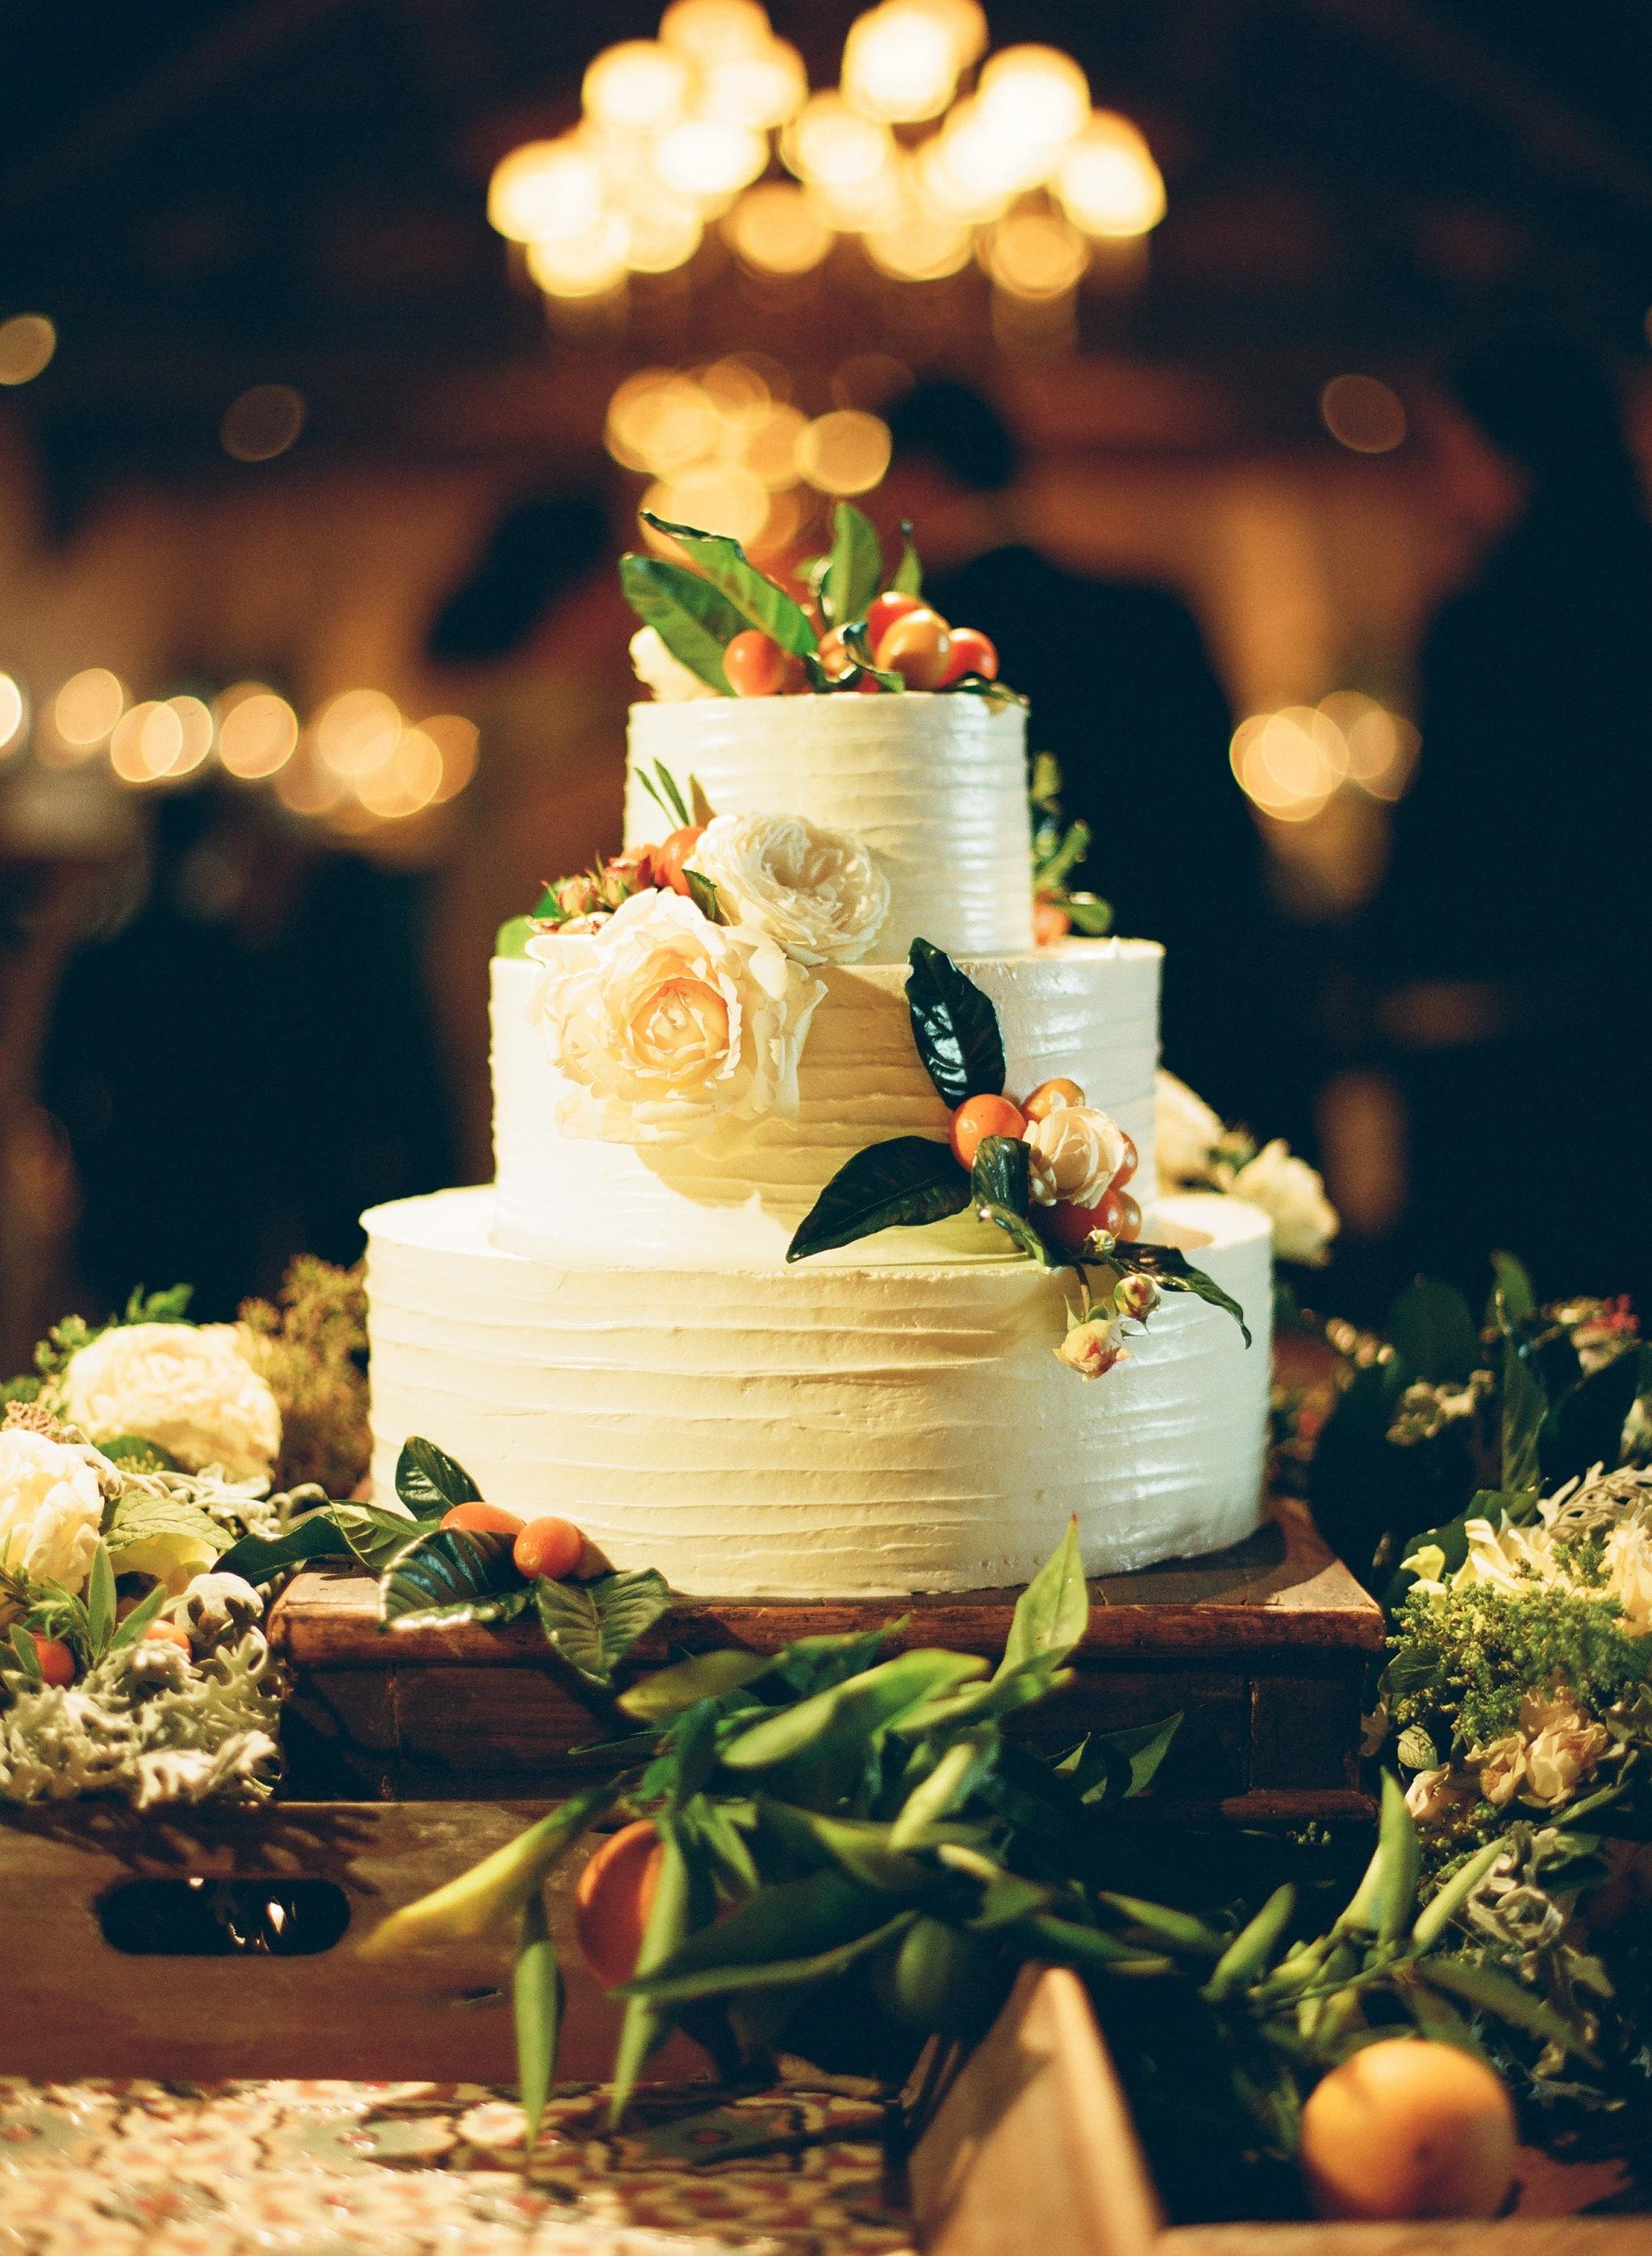 www.santabarbarawedding.com | Santa Barbara Wedding Style |  Buttercream frosting Three tier wedding cake | Megan Sorel Photography | Alexandra Kolendrianos | Four Seasons Biltmore